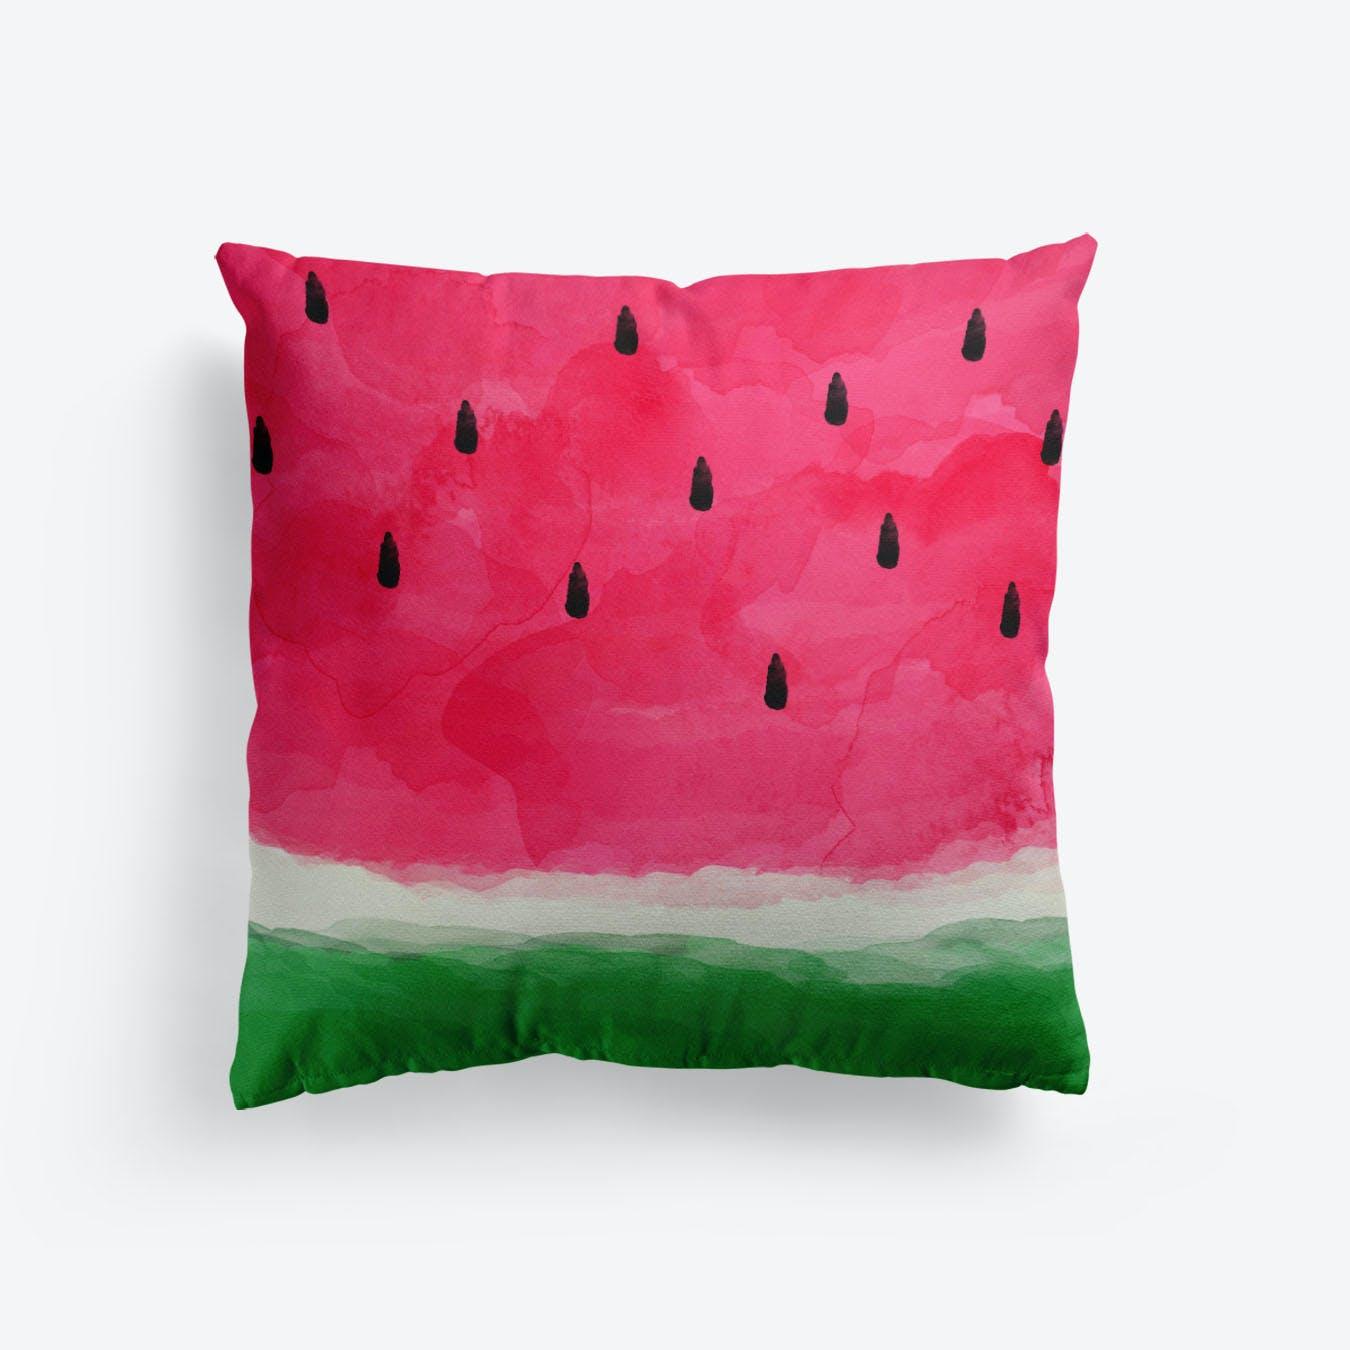 Watermelon Abstract Cushion